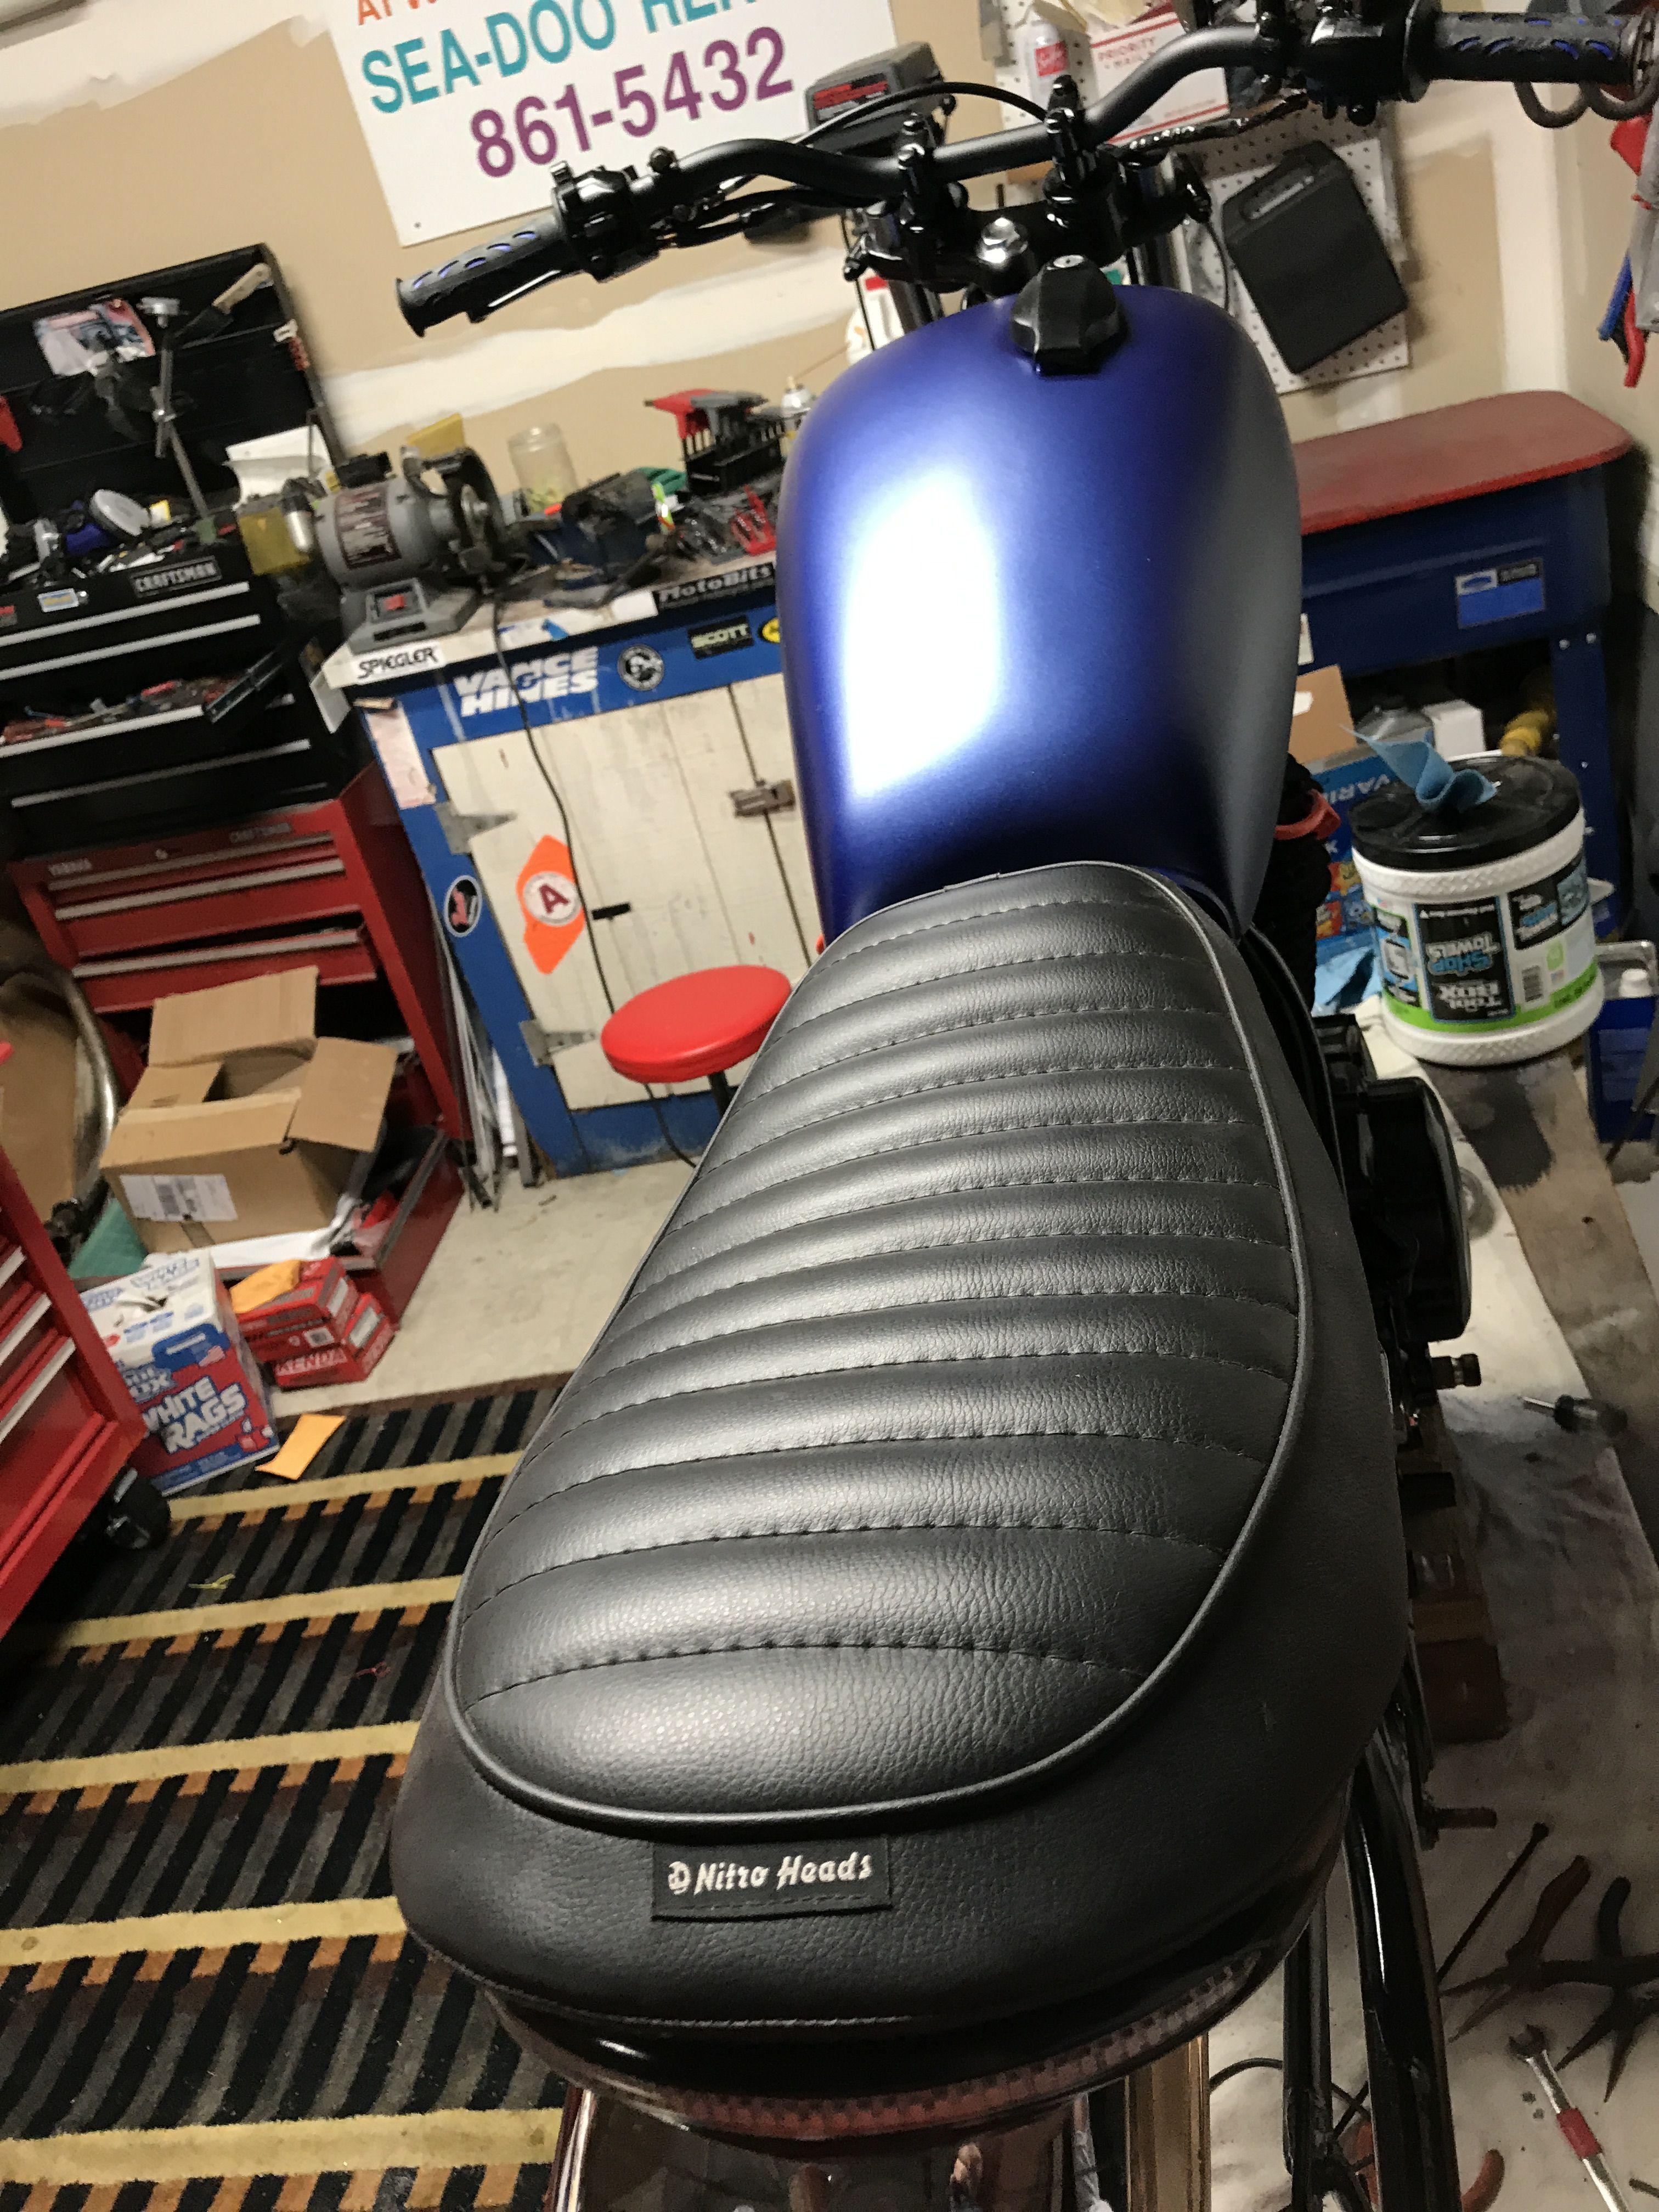 Pin by Ed Rusnak on XS400 Brat Tracker Gaming chair